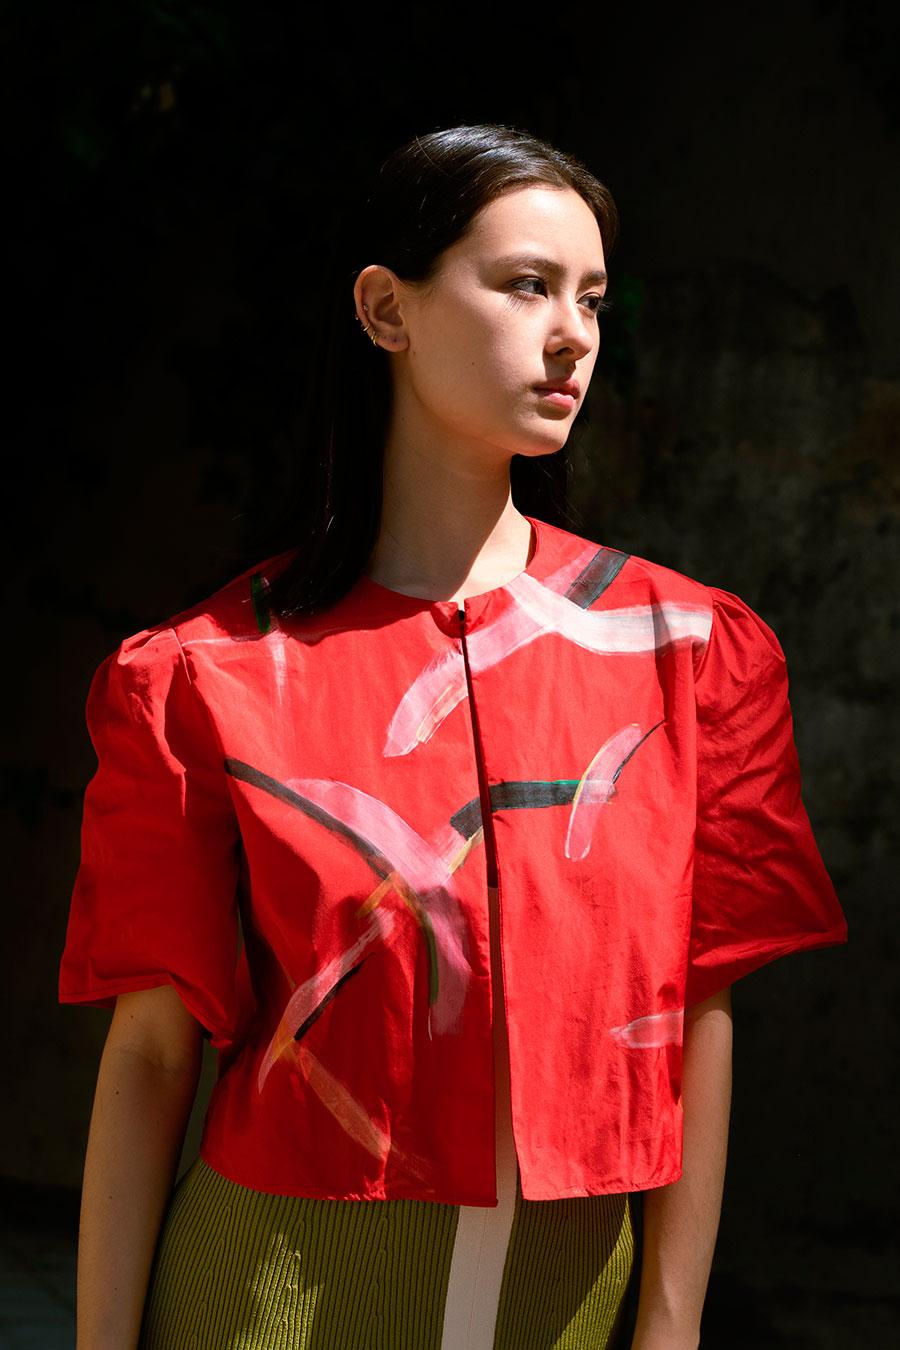 chaqueta roja de verano